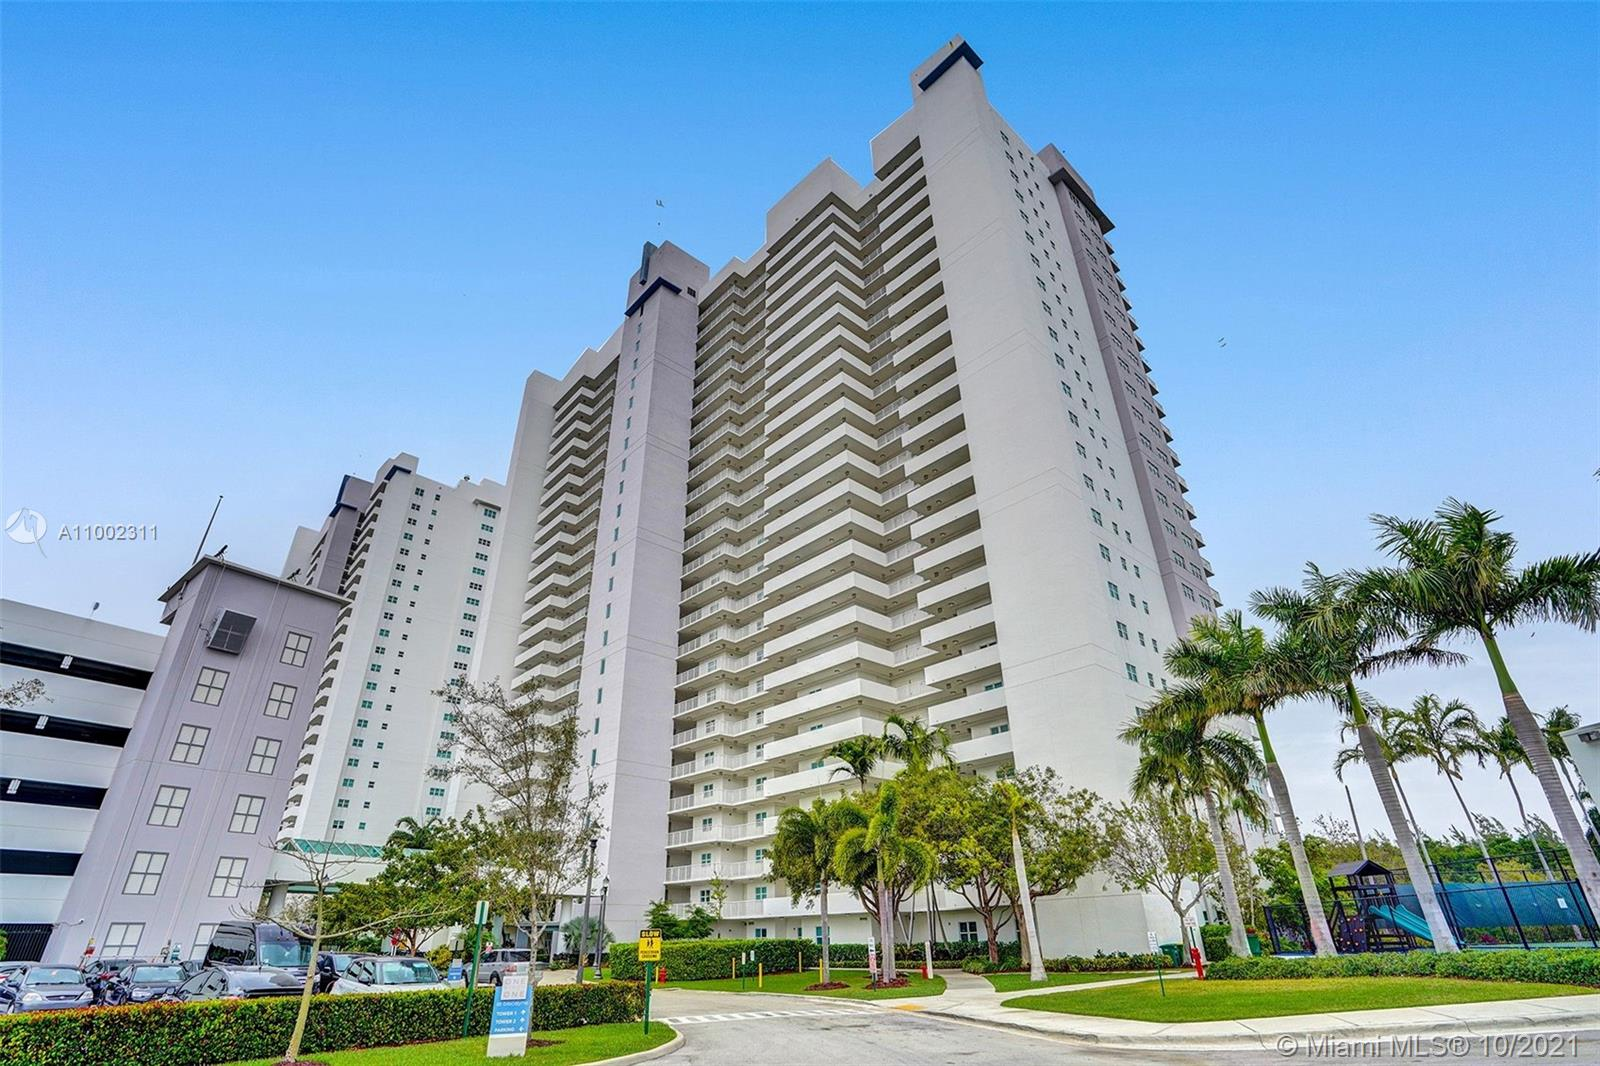 14951 Royal Oaks Ln Unit 2303, North Miami, Florida 33181